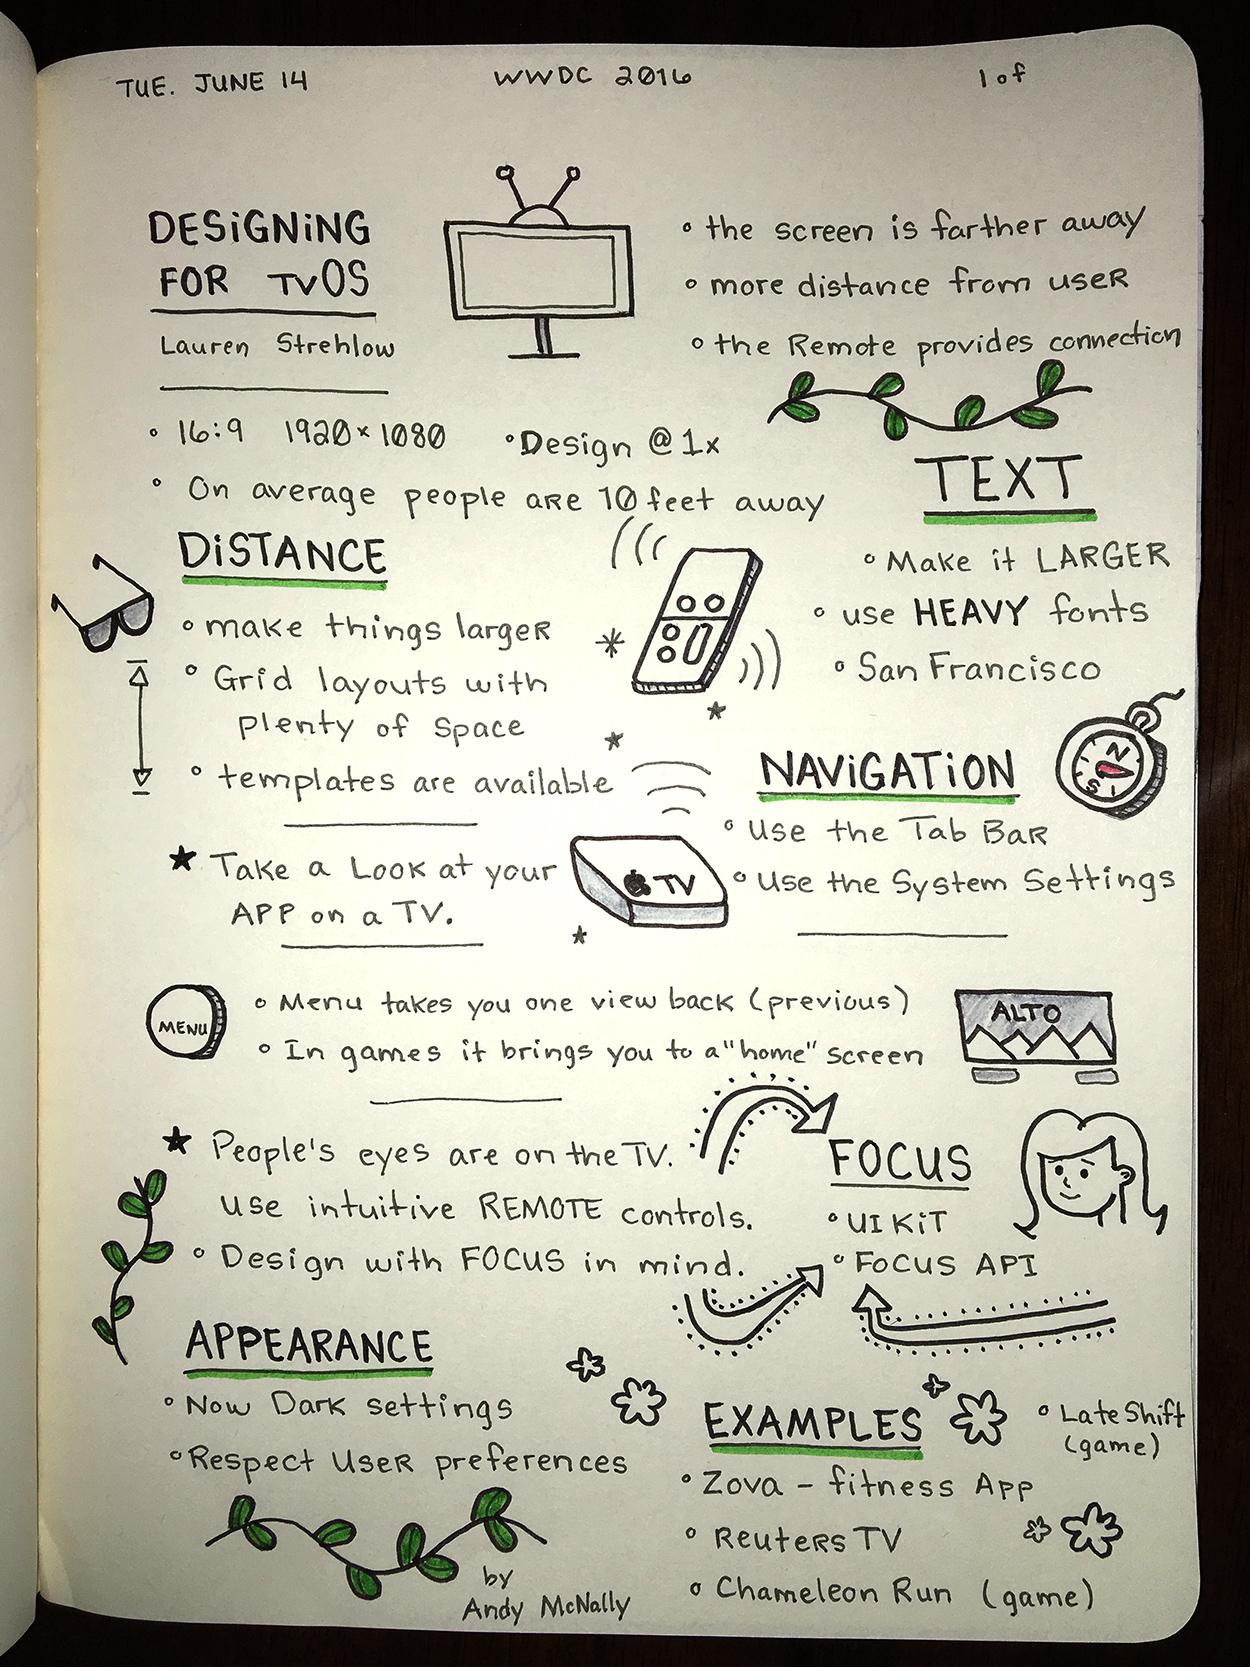 WWDC sketchnotes - Designing for tvOS